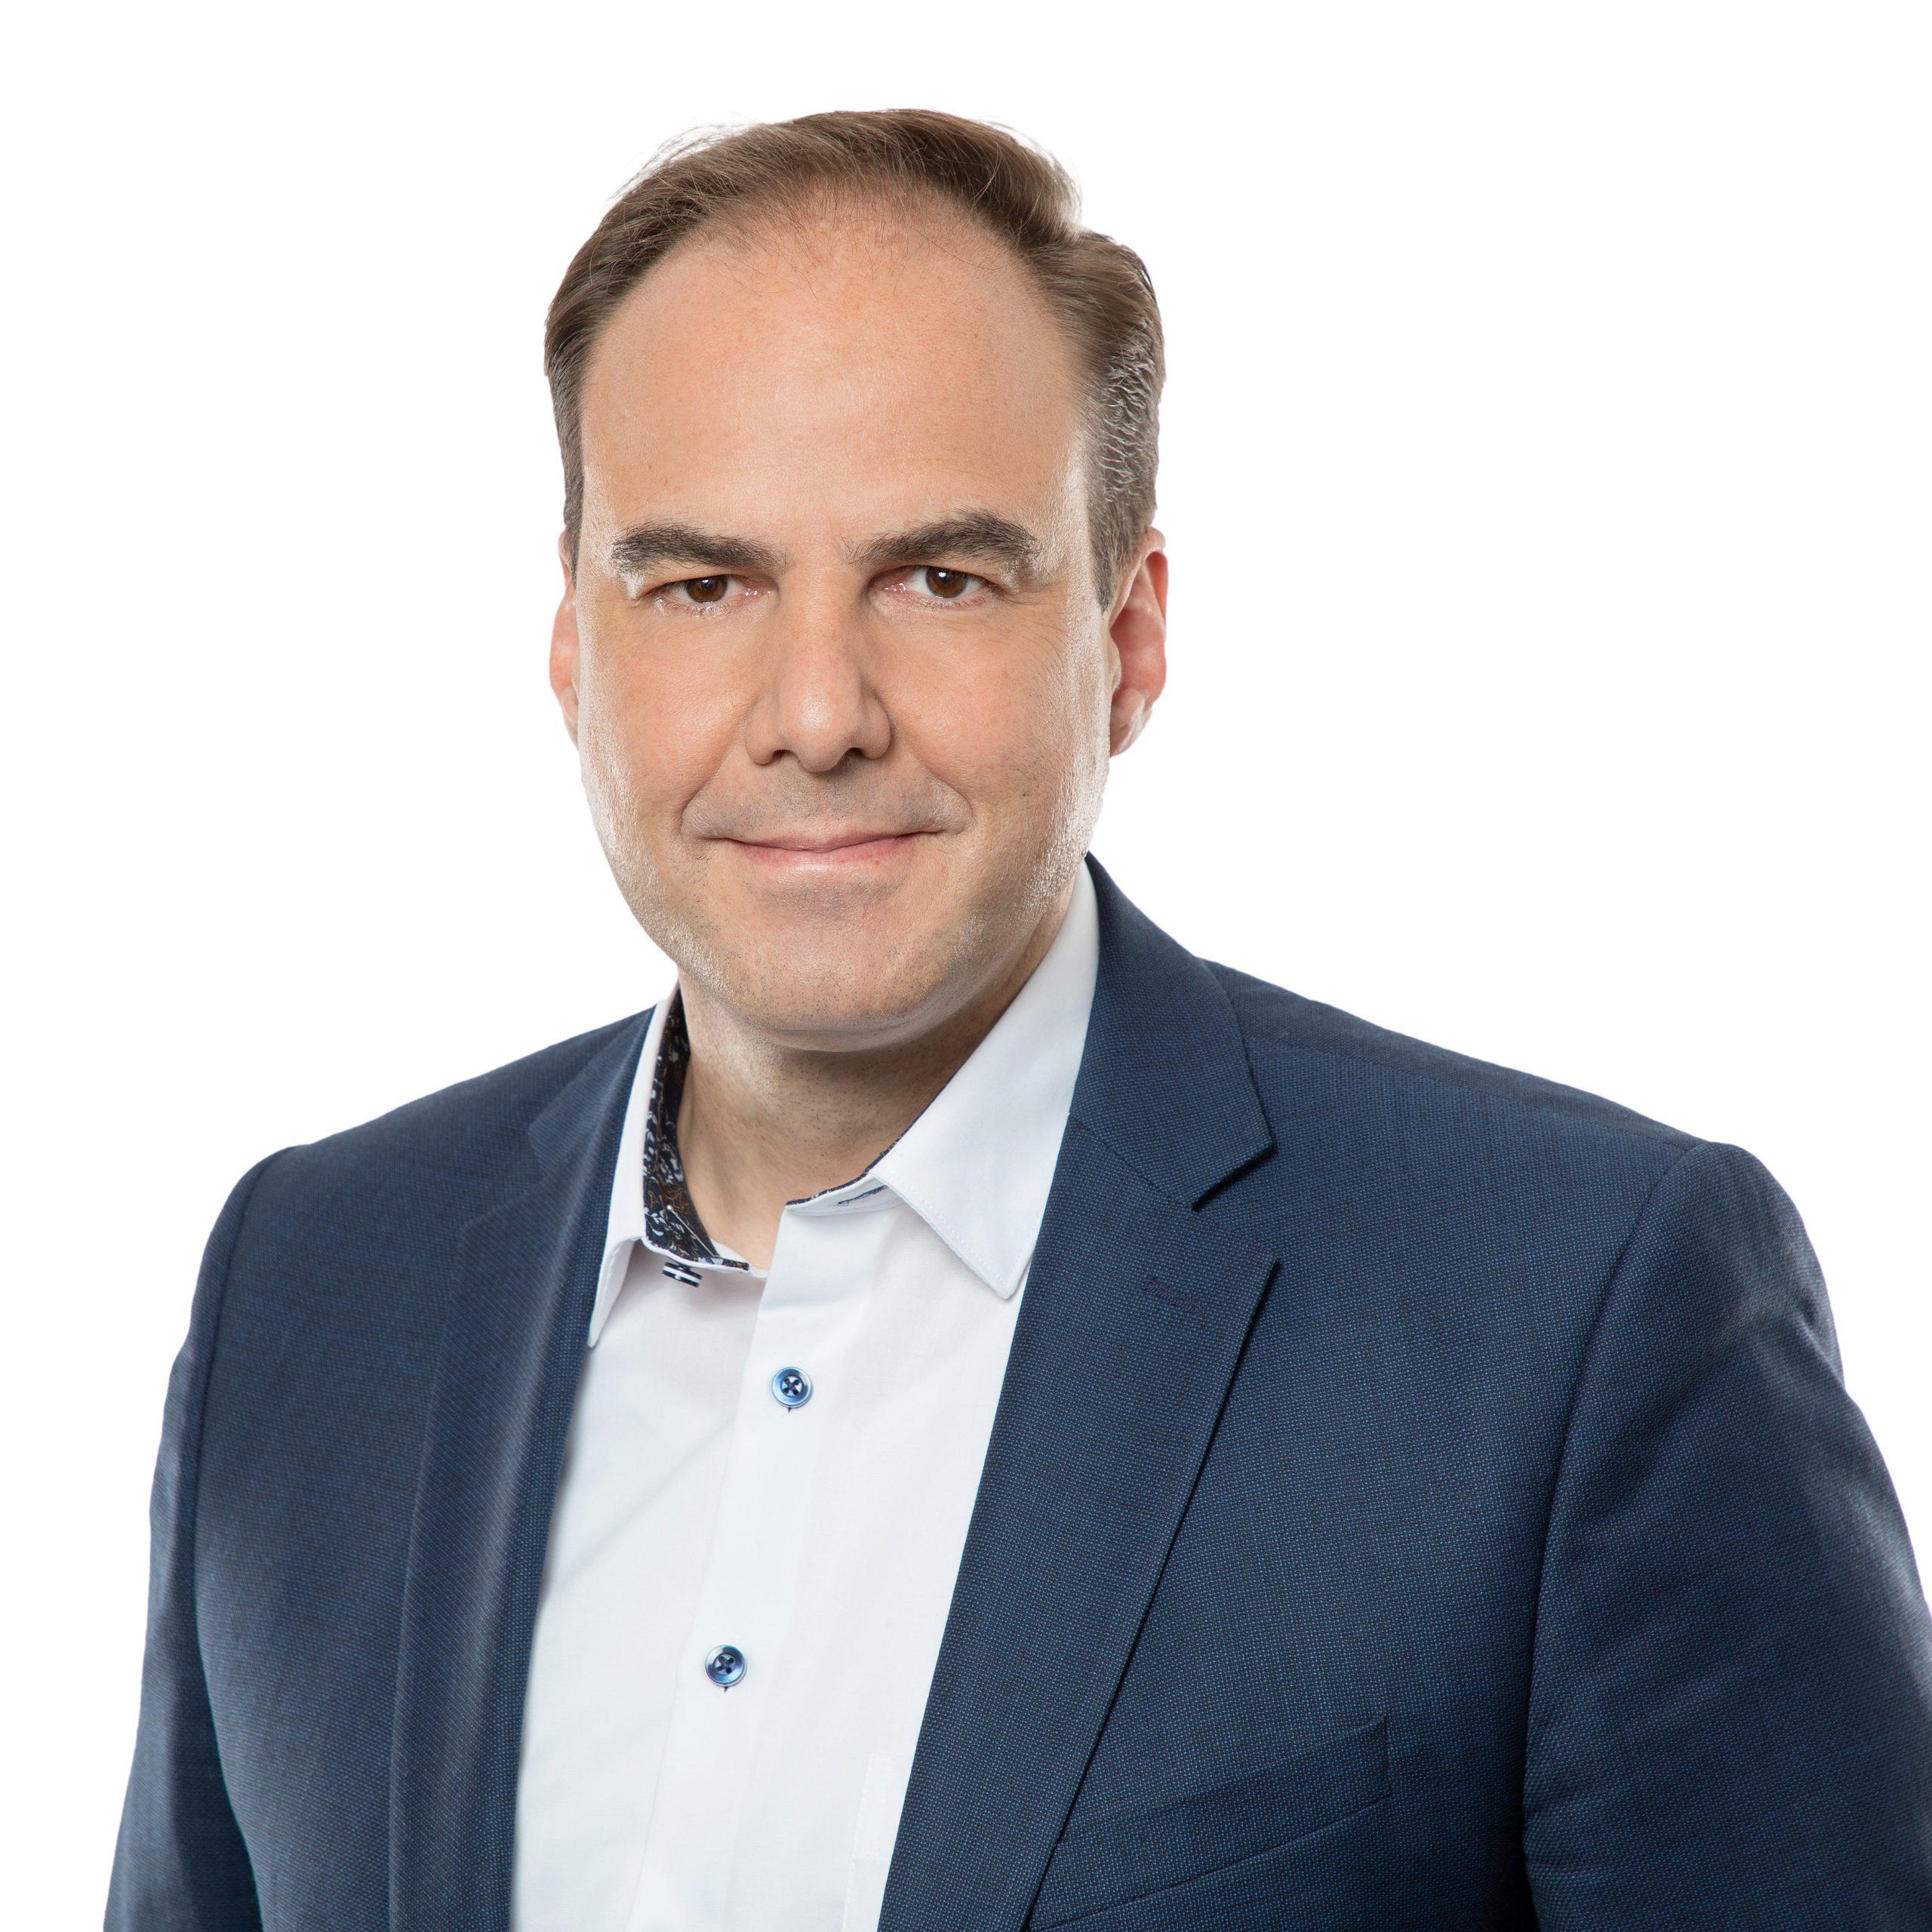 Philipp Wolff